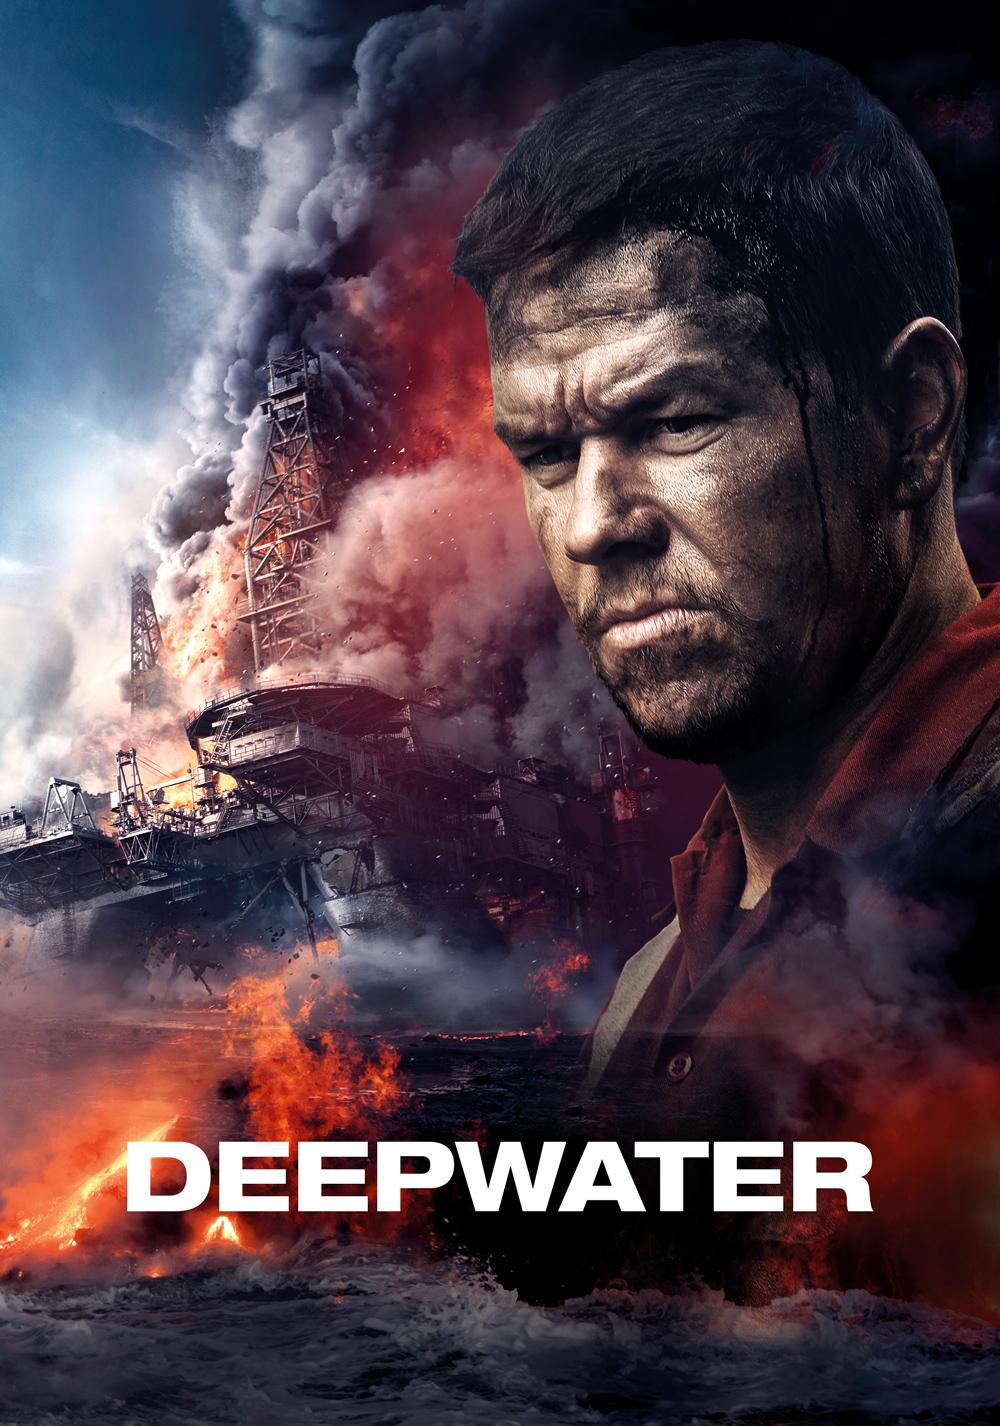 Environmental Impact of the Deepwater Horizon Oil Spill |Deepwater Horizon Movie Poster